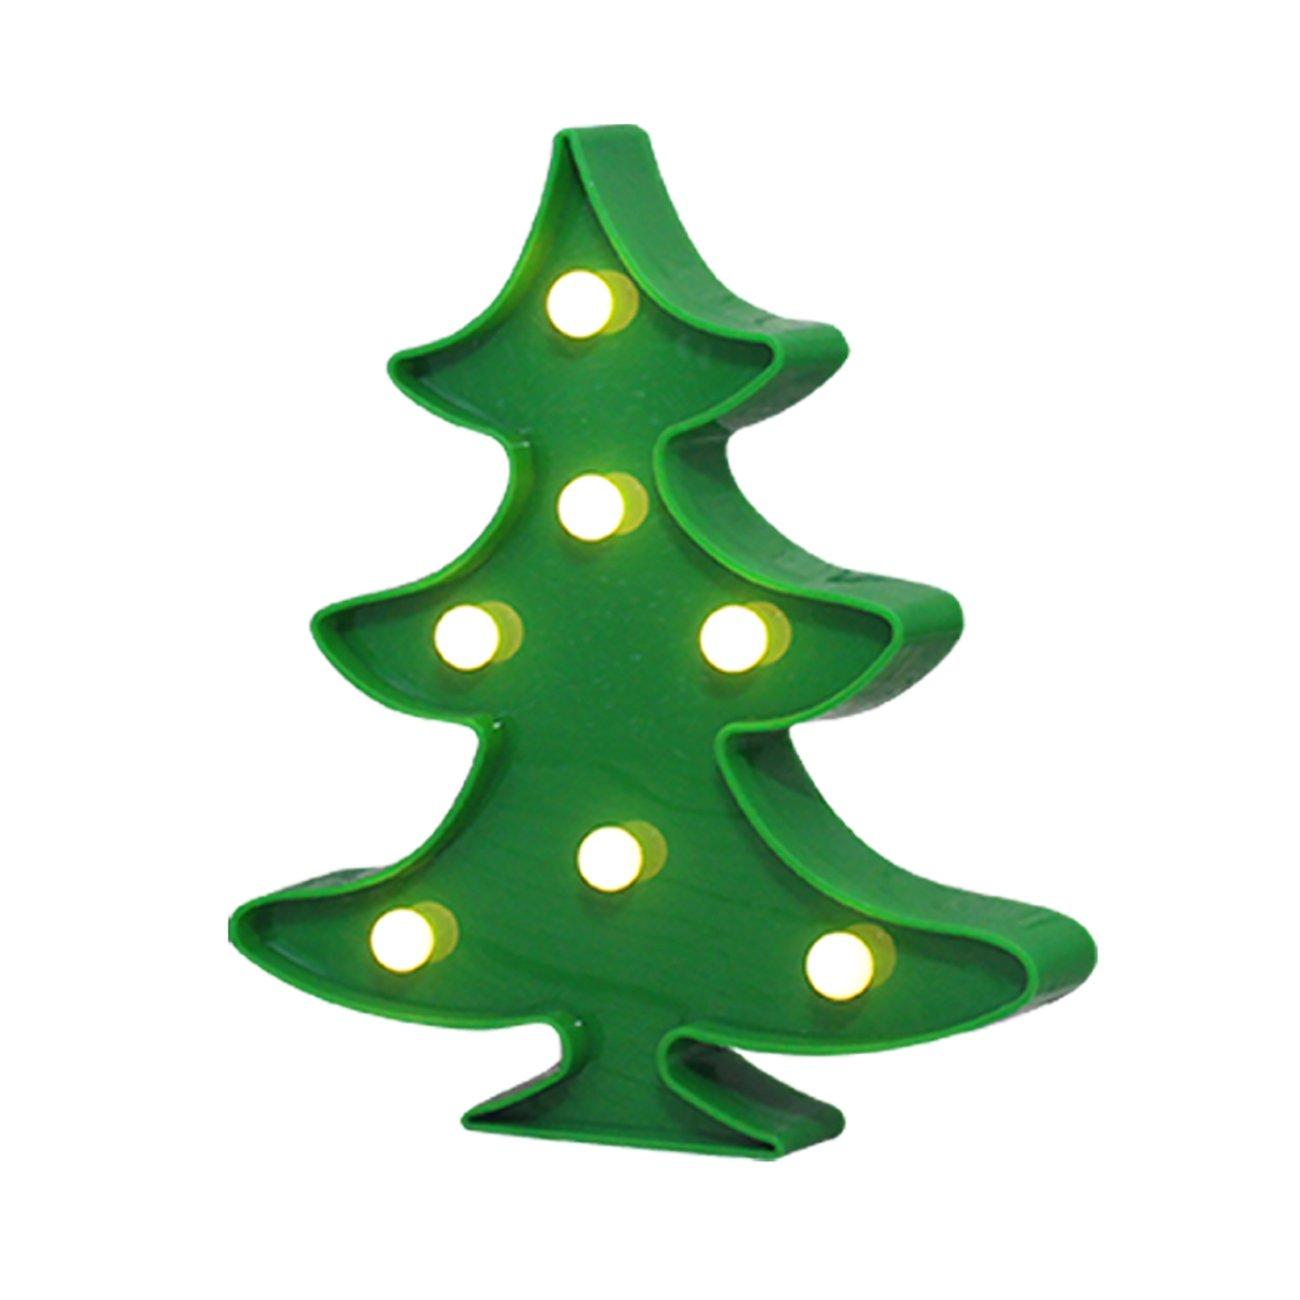 YAEerクリスマス鹿ベビーナイトライトかわいい子供部屋テーブルランプホワイトCute Elkホーム装飾ホリデーパーティー子供プレゼント Y3DNL-13 Y3DNL-13 クリスマスツリー B07CQQ2JPL B07CQQ2JPL, 生活雑貨 ココ笑店:187f6bc9 --- ijpba.info